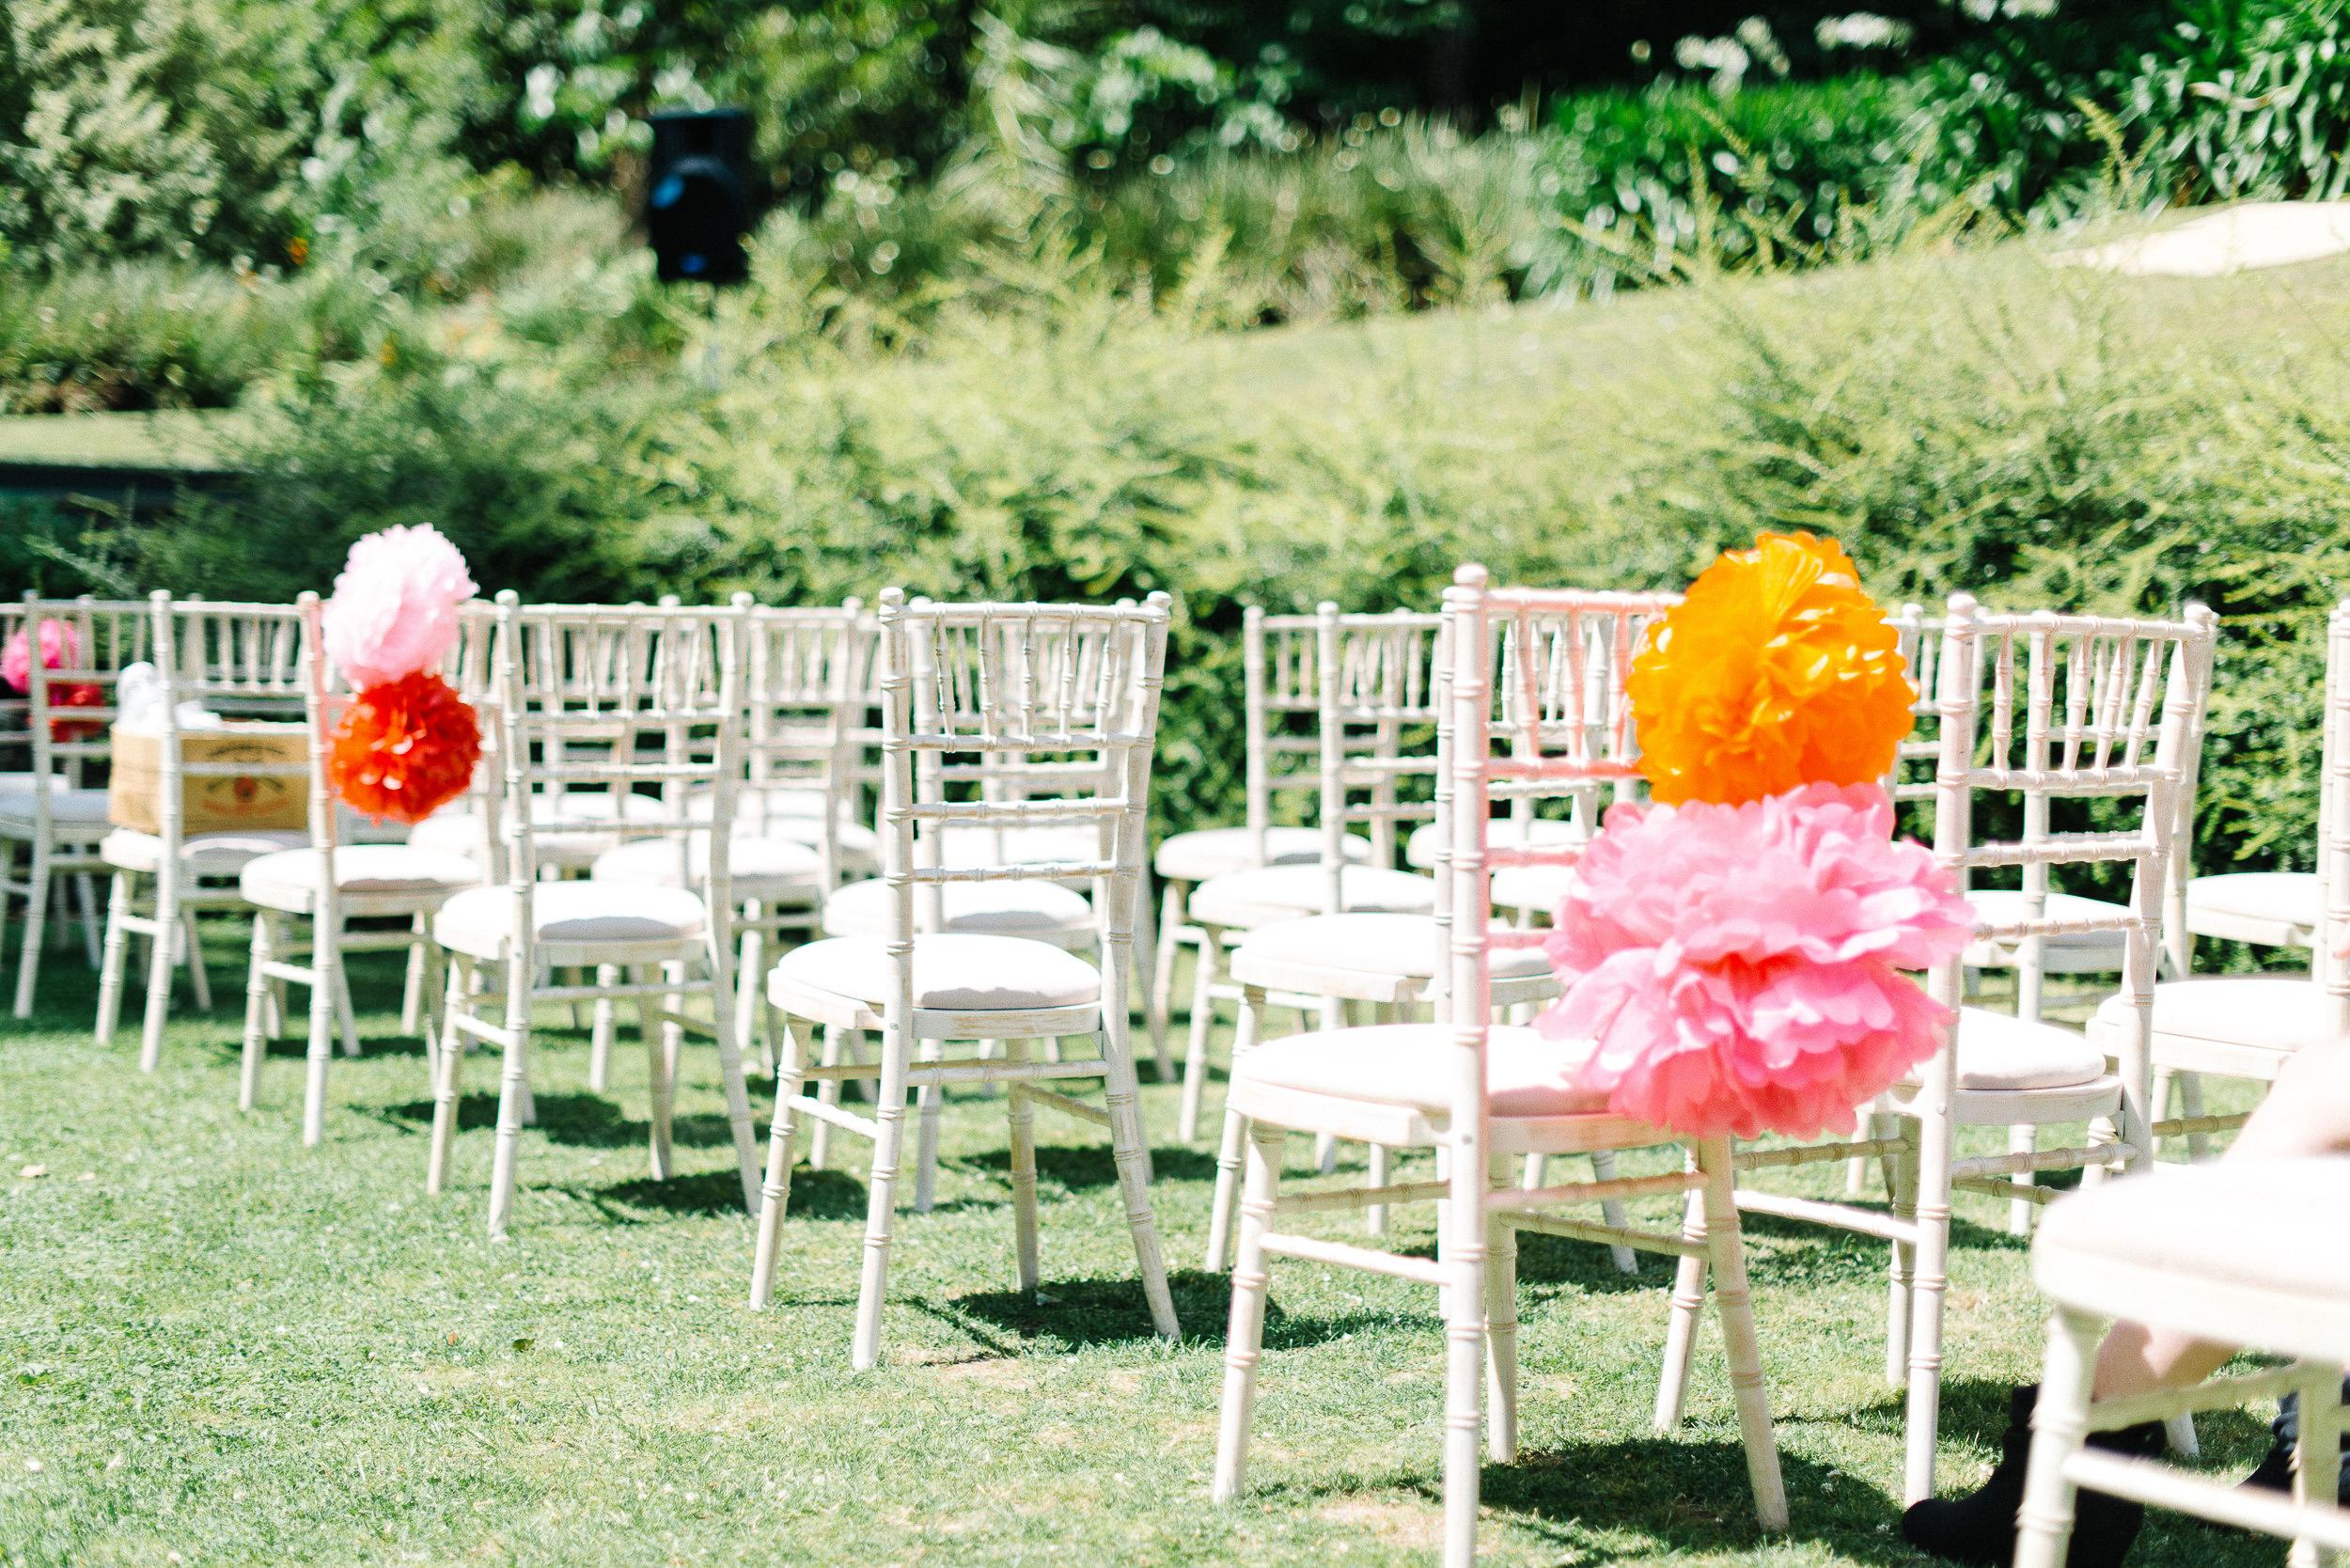 New-Zealand-Wedding-Photographer-11.jpg